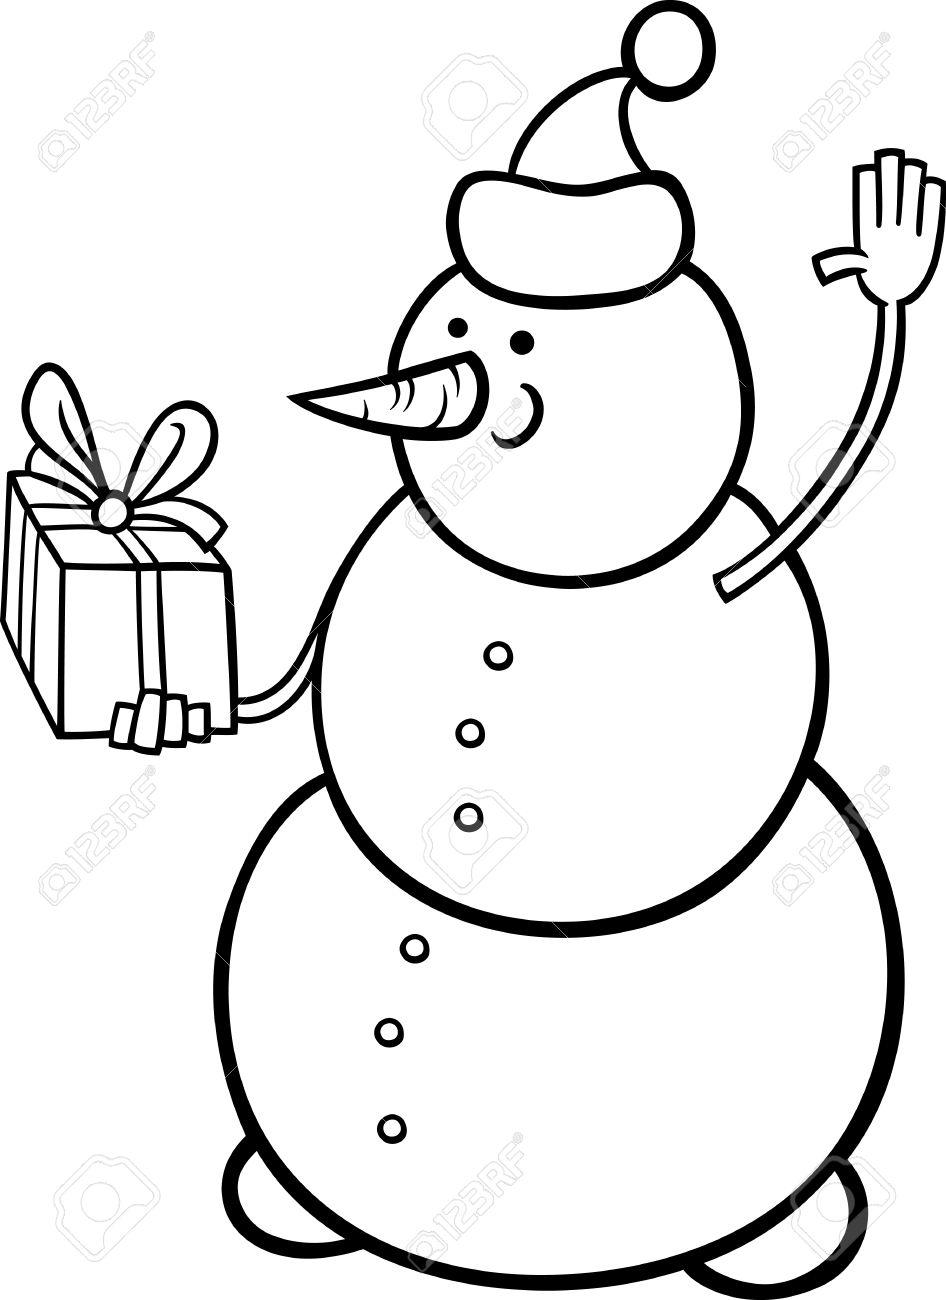 946x1300 Black And White Cartoon Illustration Of Snowman As Santa Claus